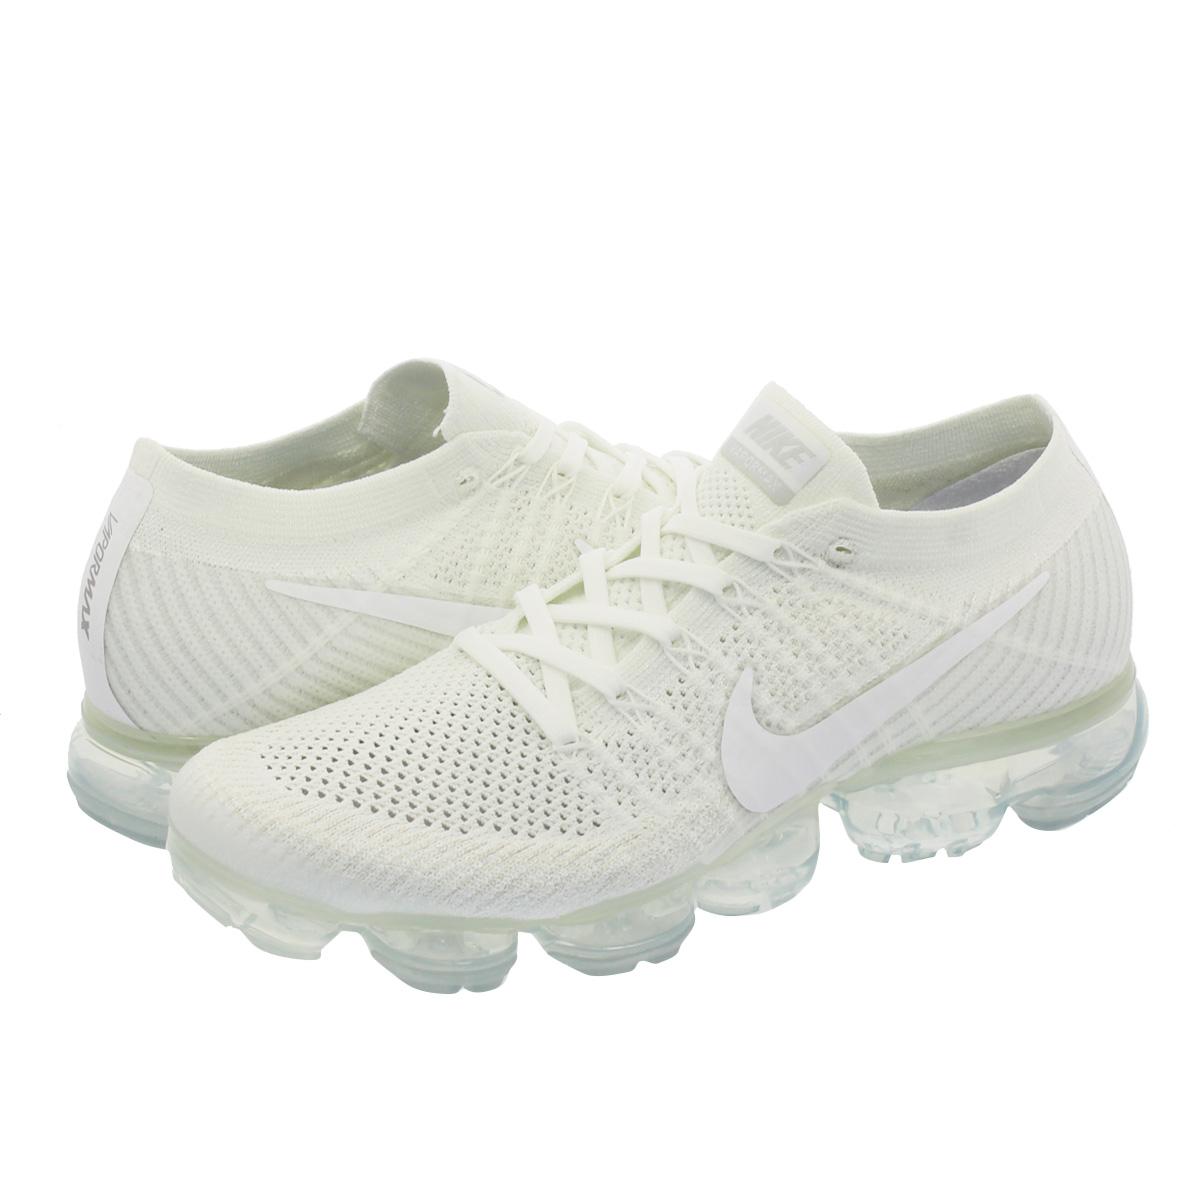 Nike Air Vapormax Shop Air Vapormax Flyknit Men Gray Nike